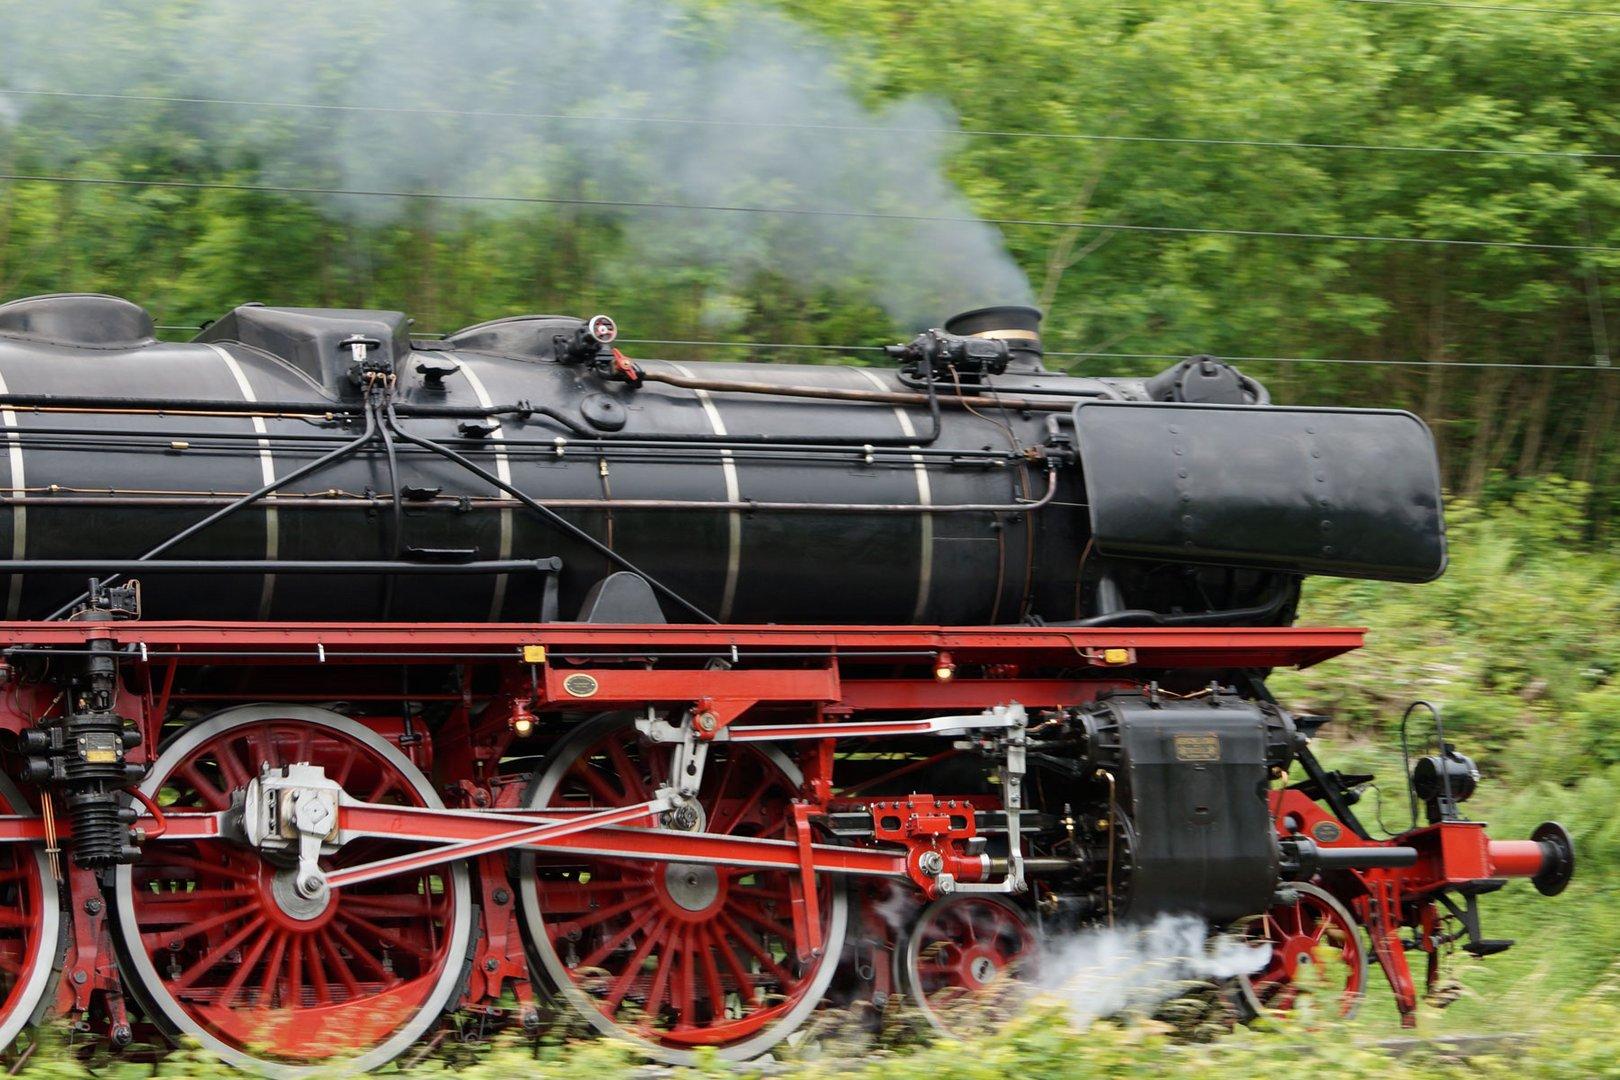 Lok 01 202 in Hirschhorn (Neckar)